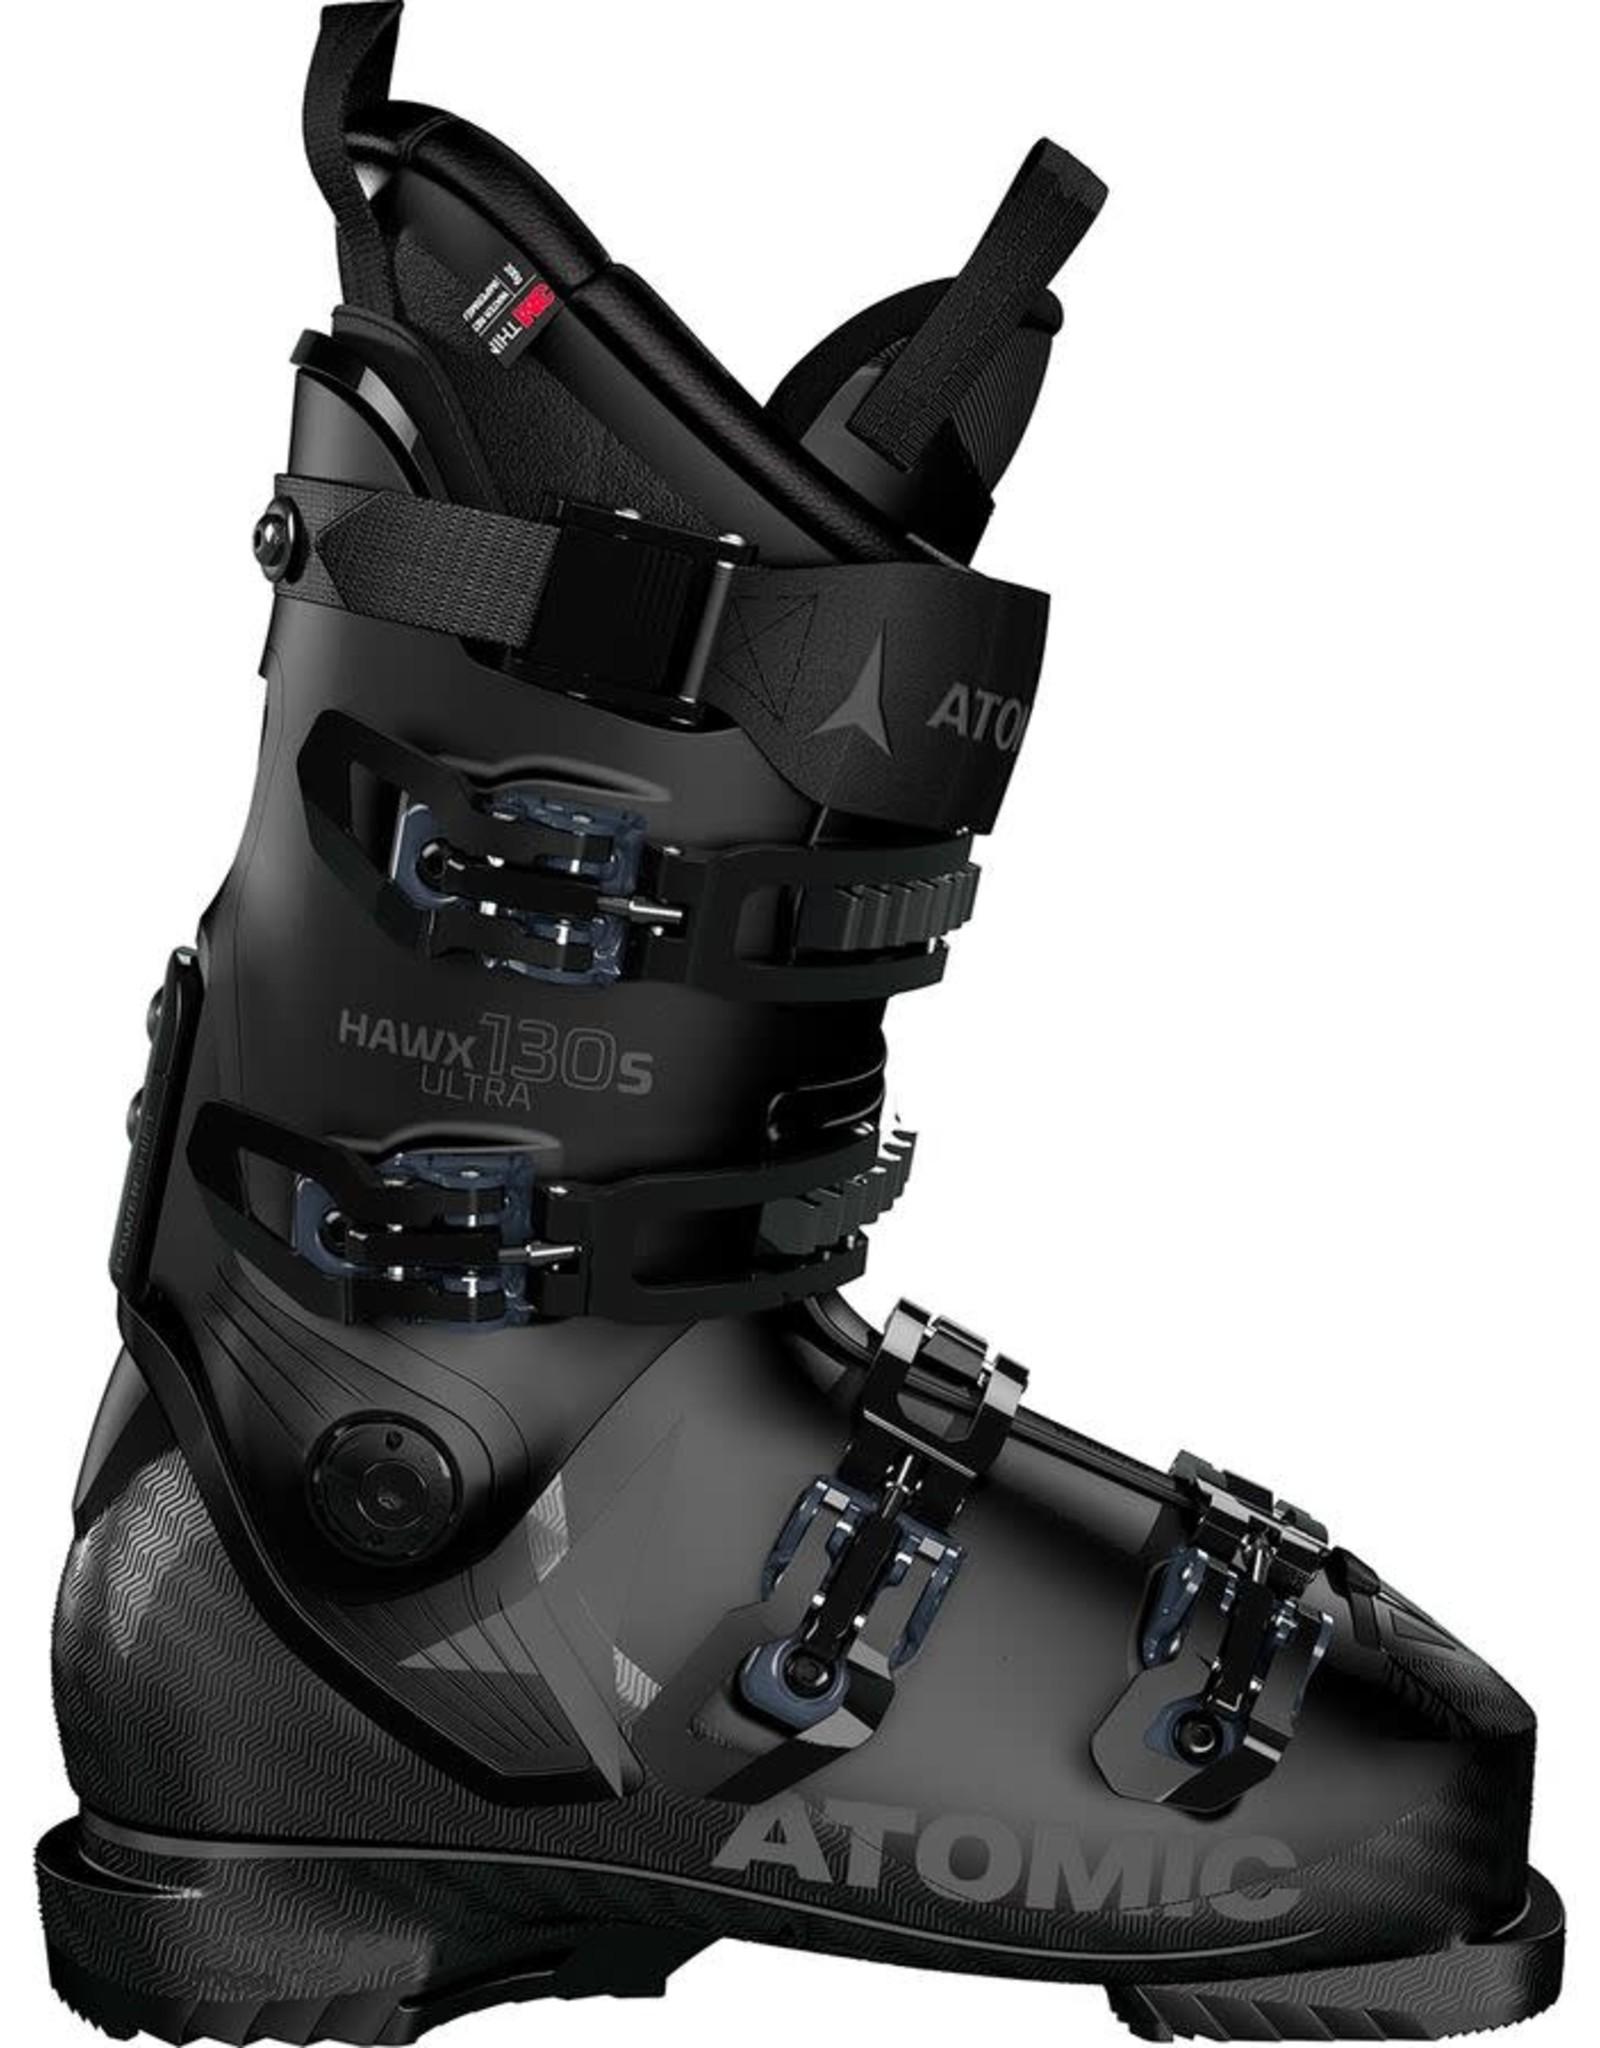 ATOMIC ATOMIC Ski Boots HAWX ULTRA 130 S (20/21)